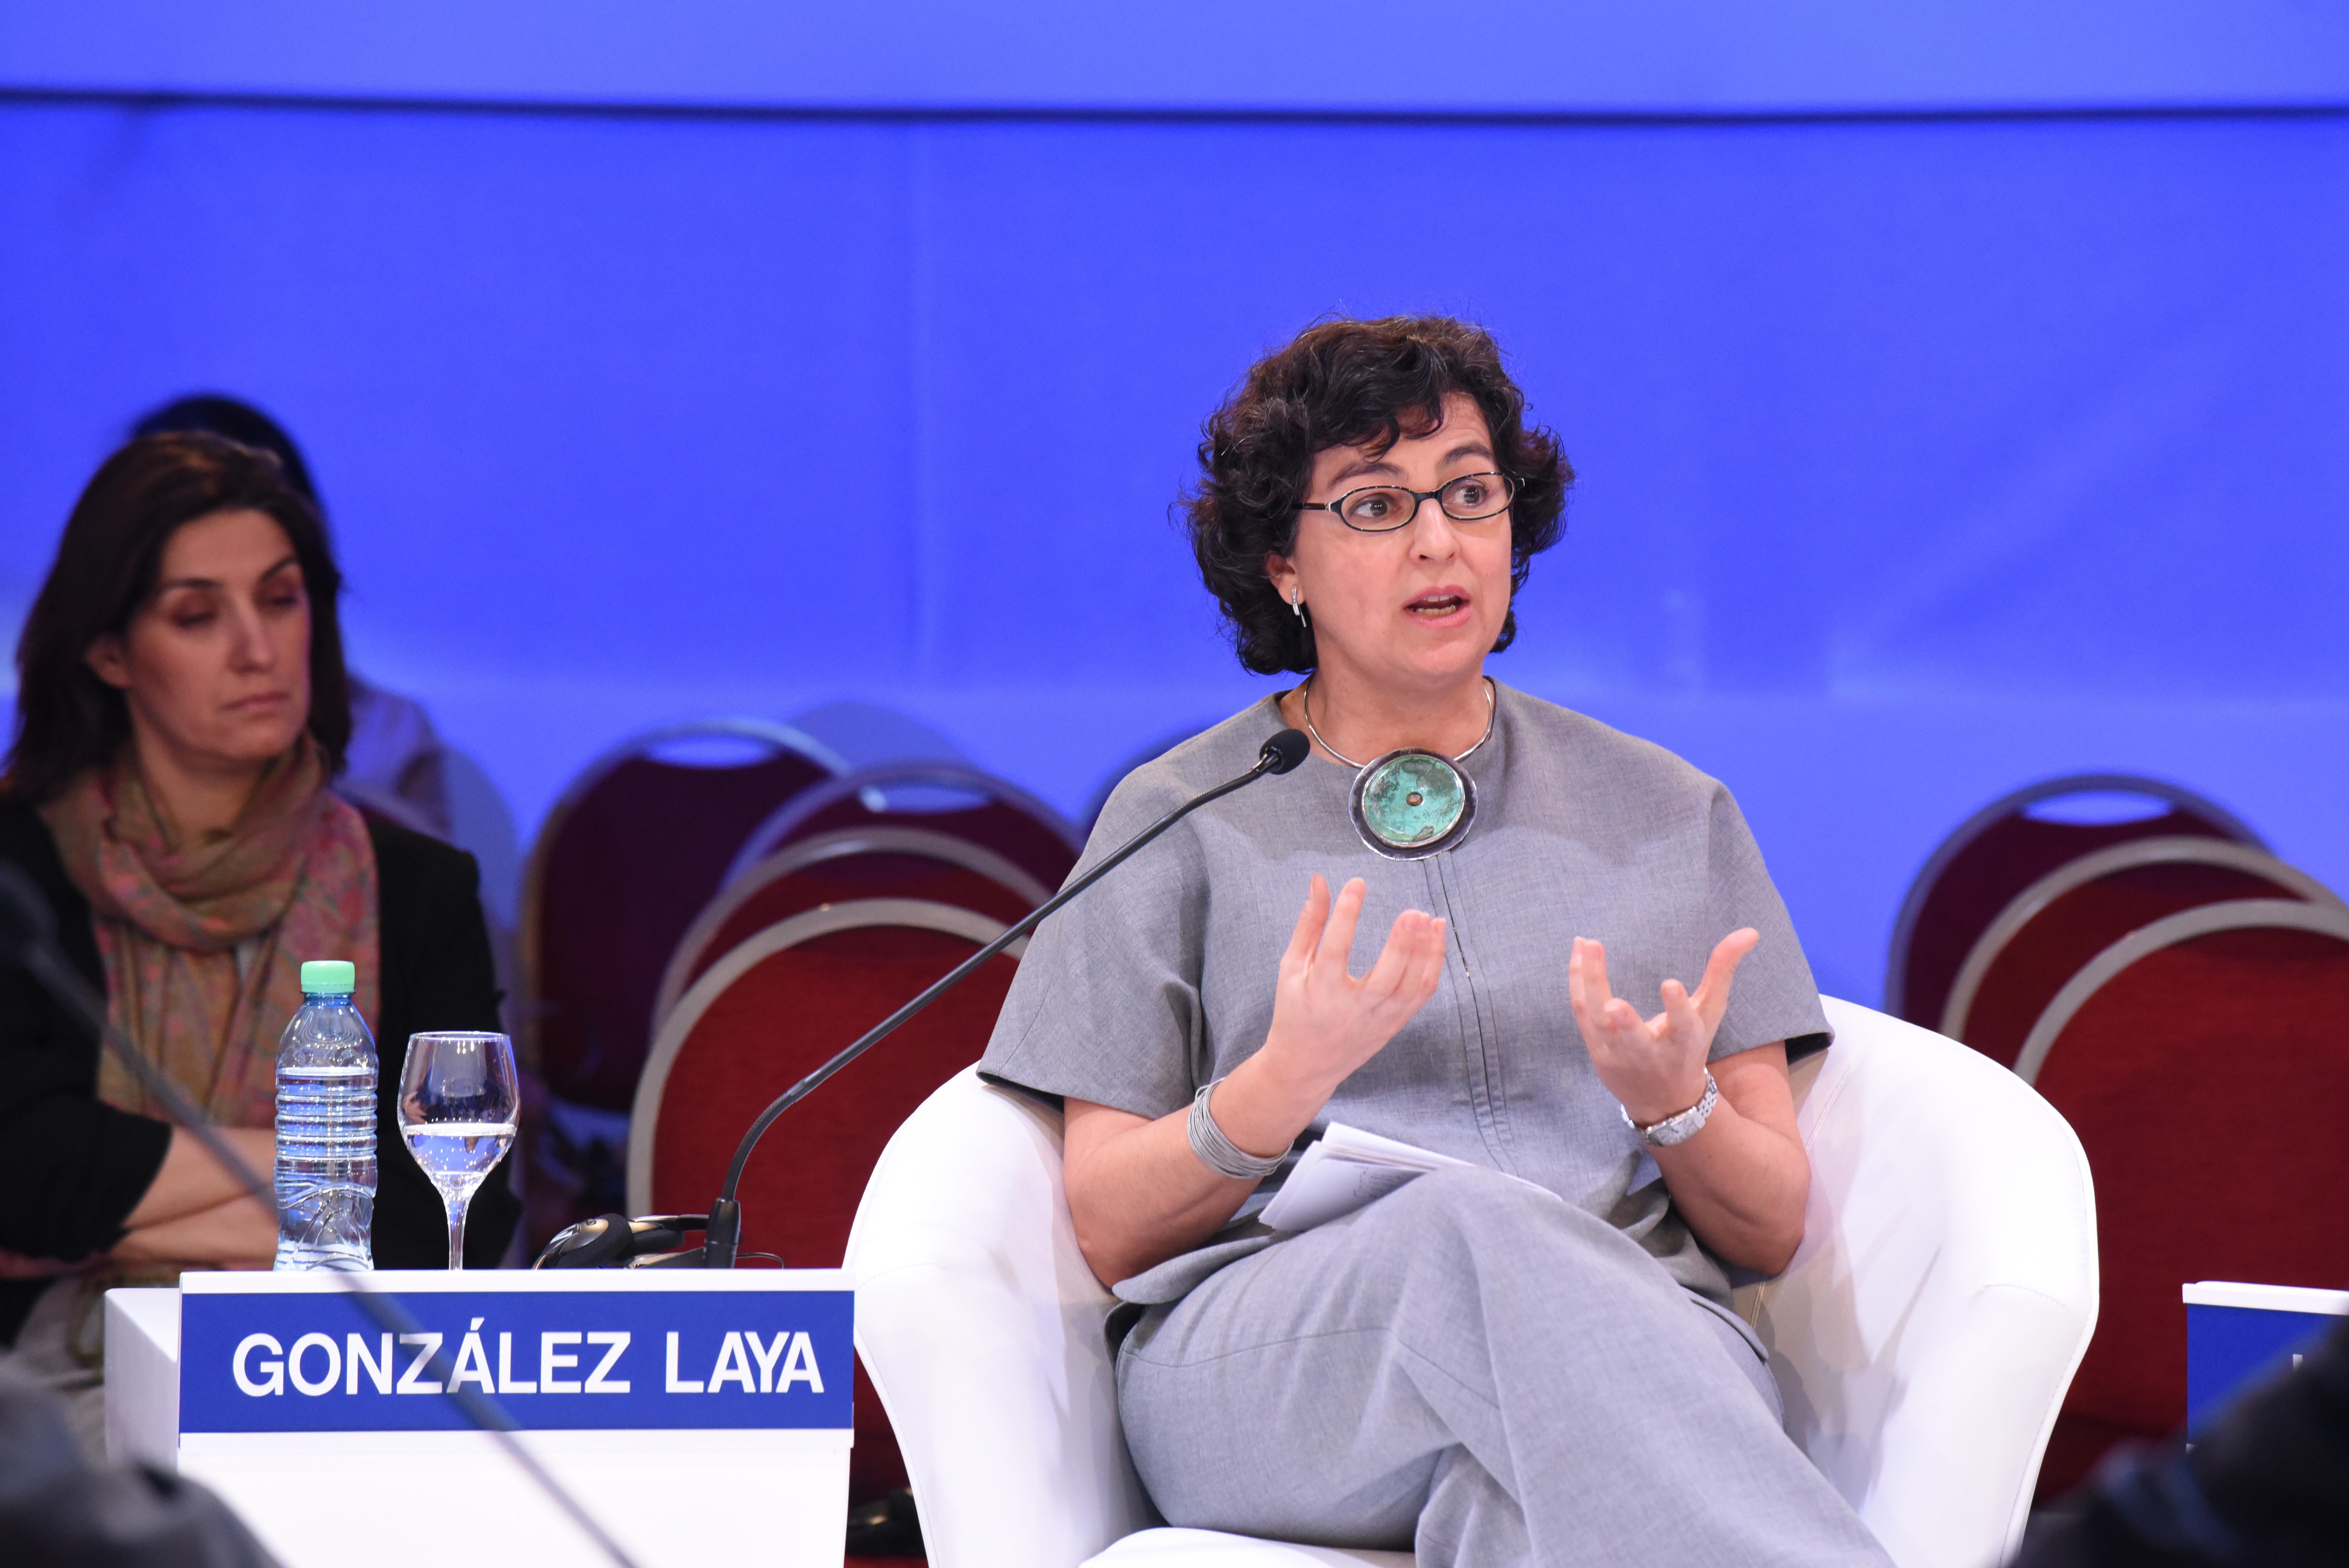 Arancha Gonzalez Laya, Executive Director, International Trade Centre (ITC), Geneva at the World Economic Forum on Latin America 2017 in Buenos Aires, Argentina. Copyright by World Economic Forum / Marcelo Bartolomé